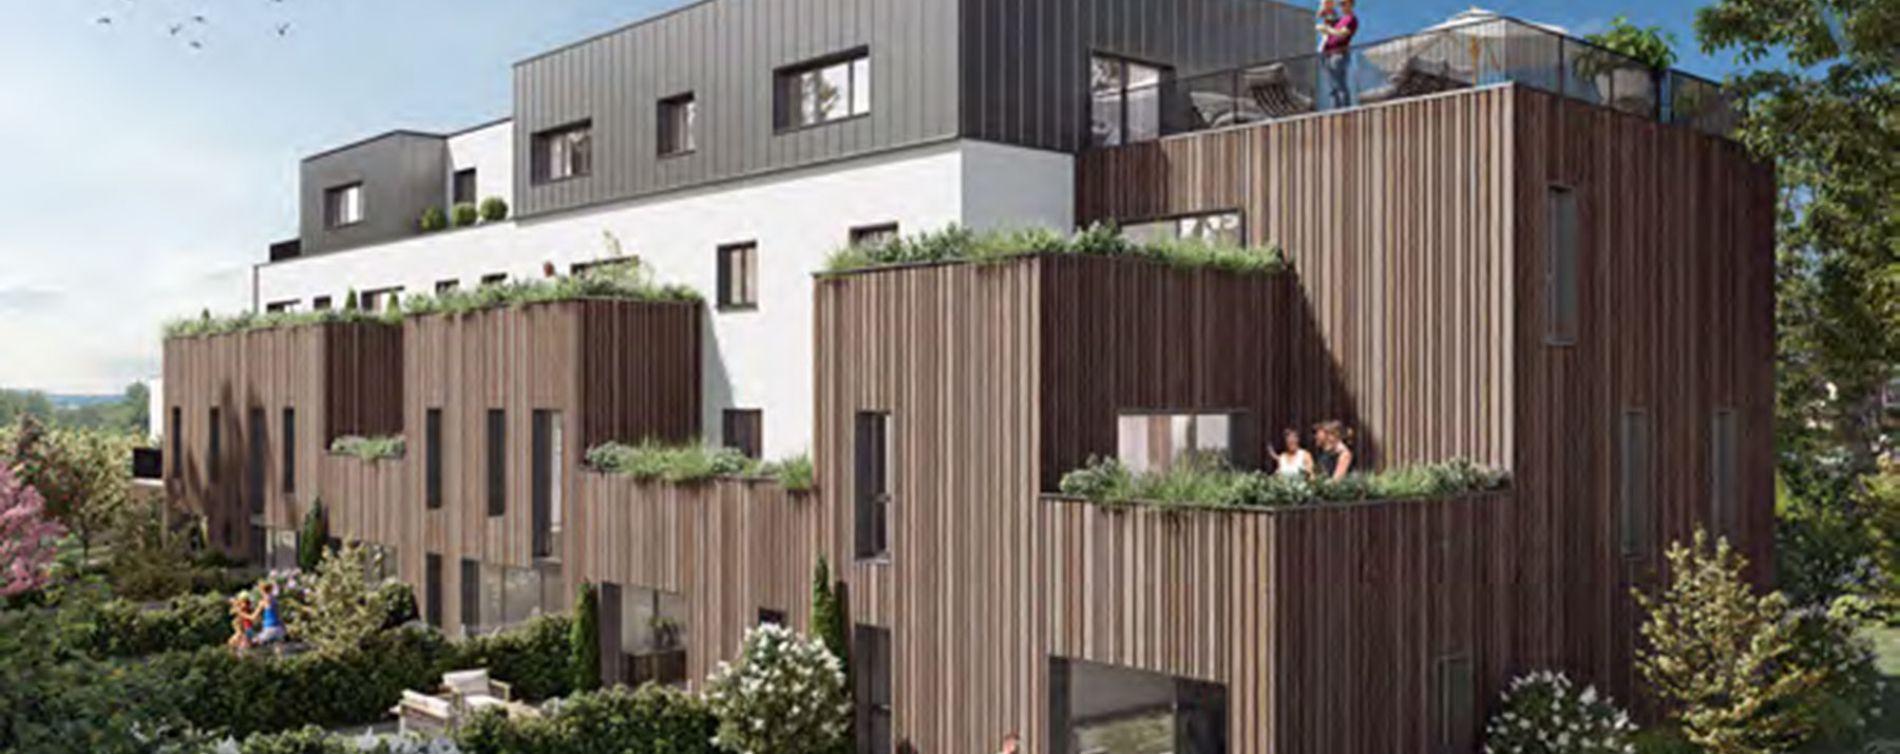 Sainghin-en-Weppes : programme immobilier neuve « Naturessence » (2)